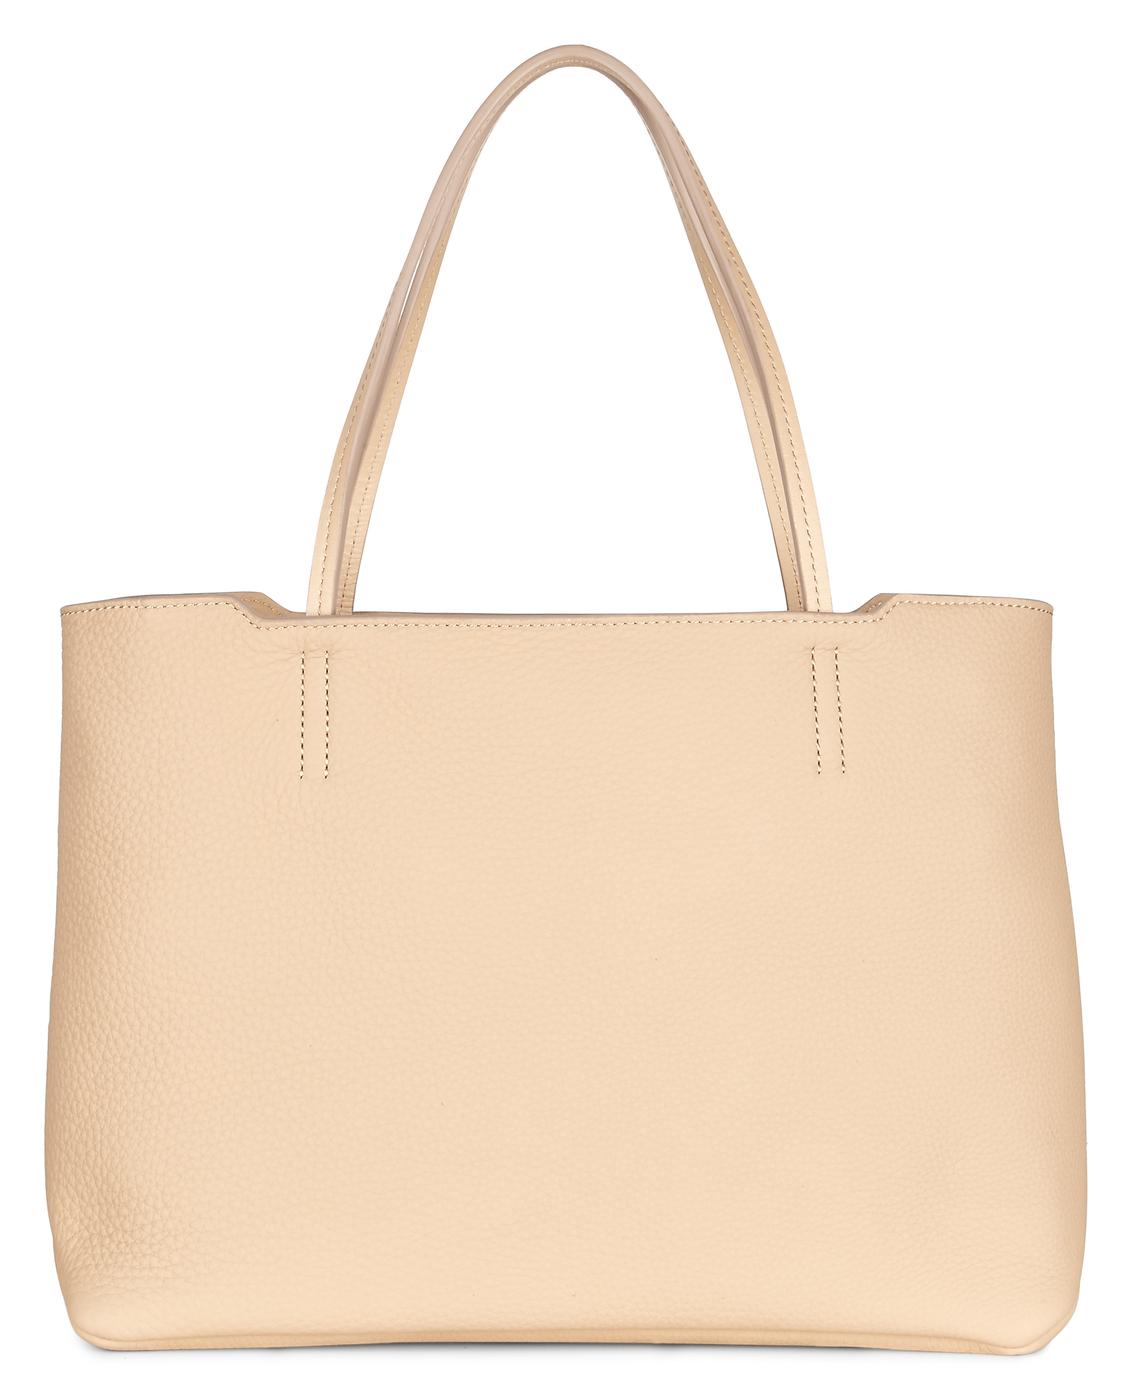 c27ac439bb ECCO Jilin Small Shopper | Women's Handbags | ECCO® Shoes